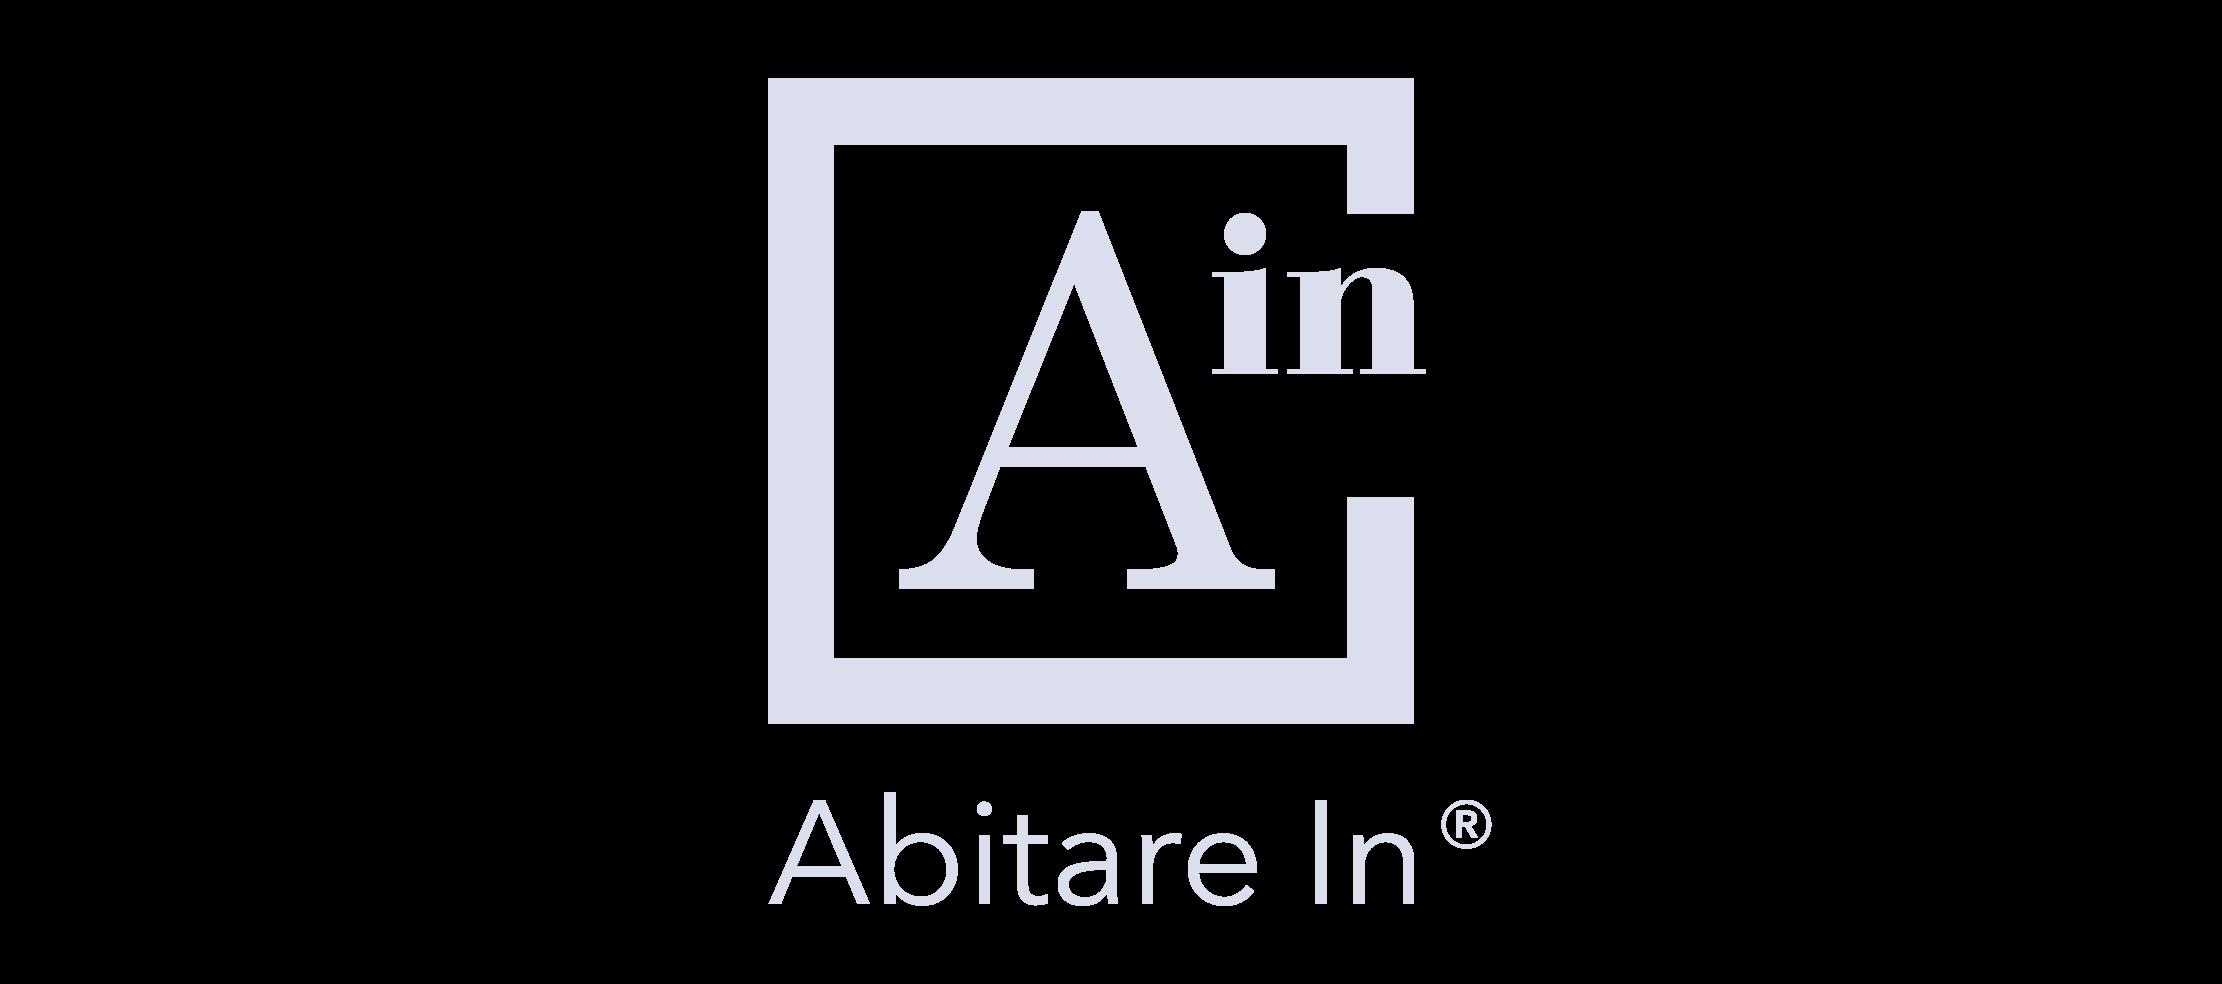 logo abitare in, one of FifthIngenium clients